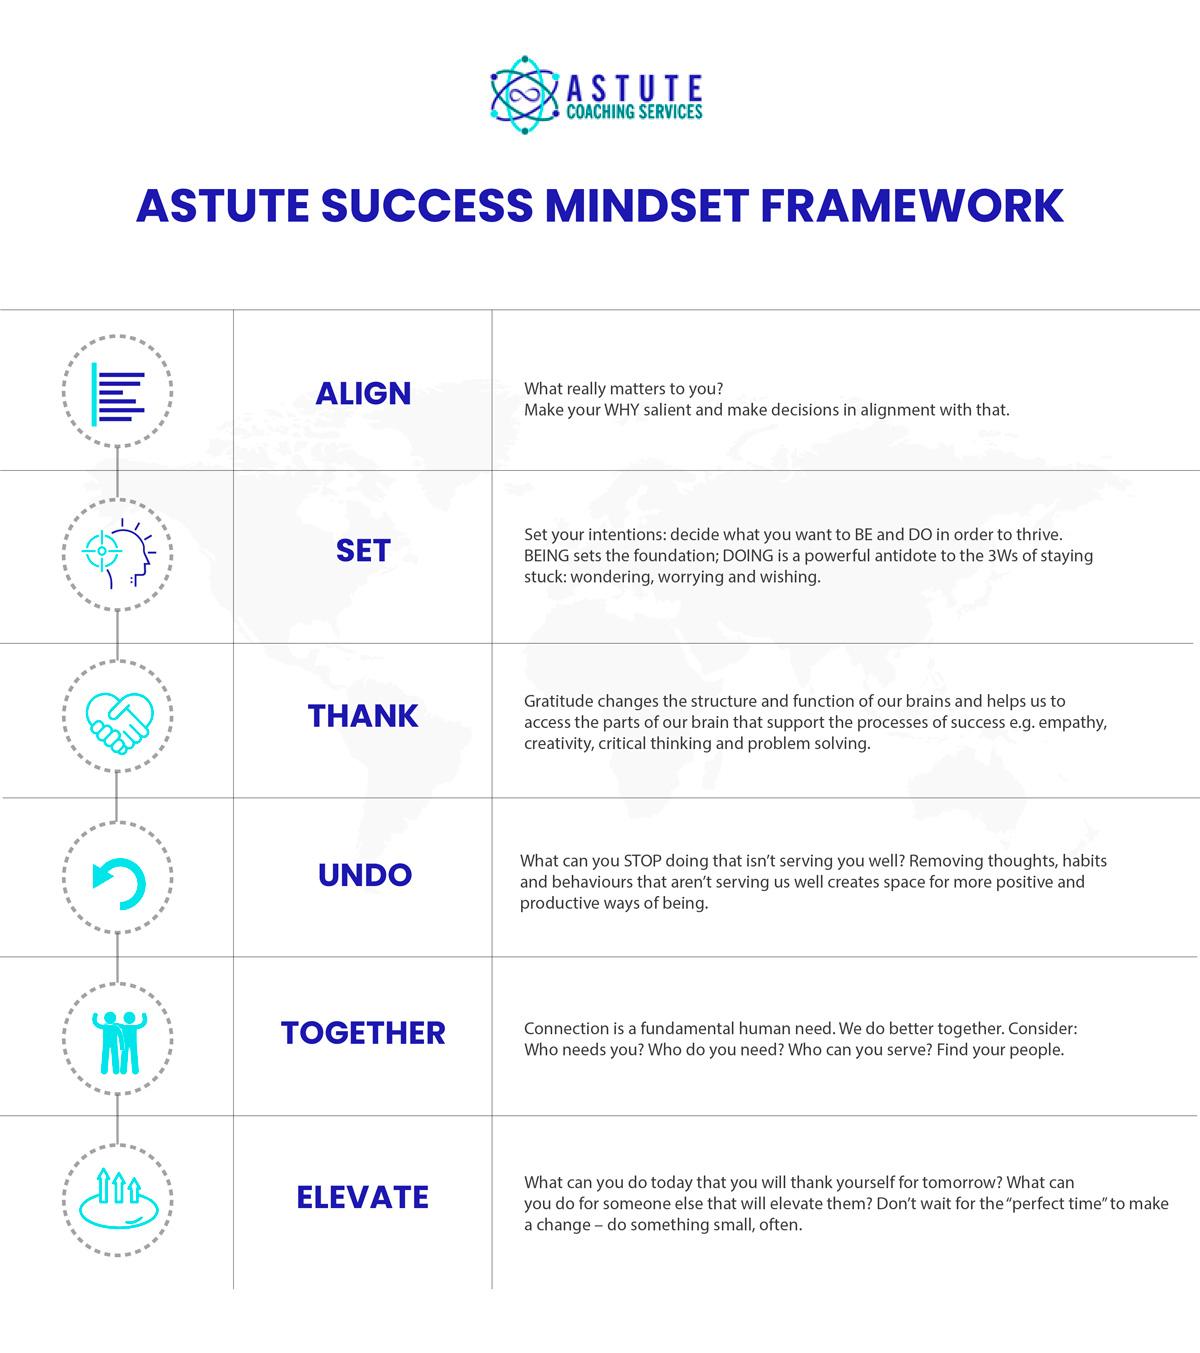 ASTUTE-Success-Mindset-framework